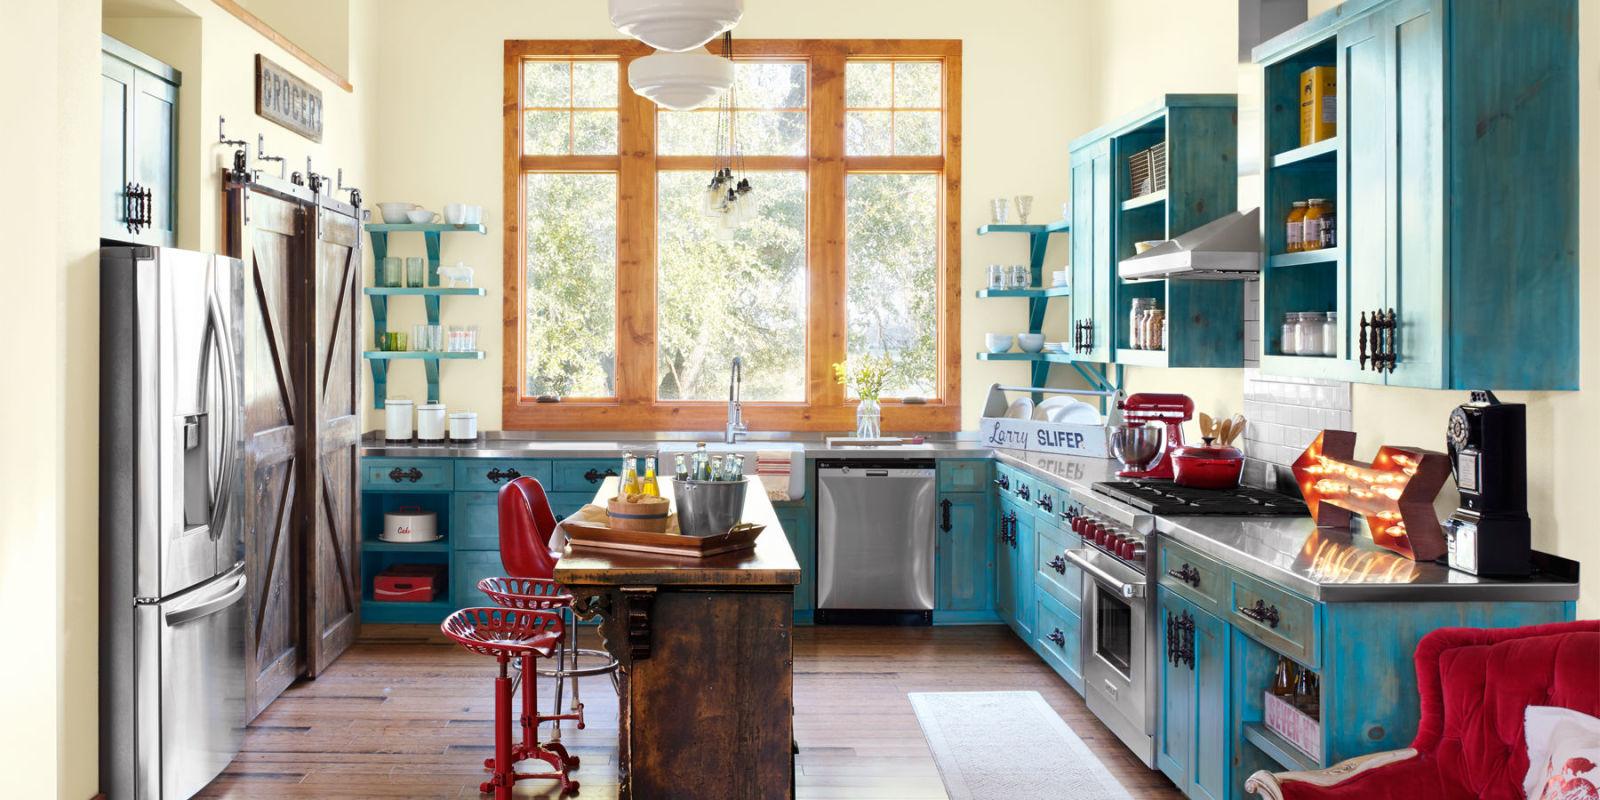 Best Kitchen Gallery: Home Decor Themes Oyle Kalakaari Co of Home Decor Designs  on rachelxblog.com